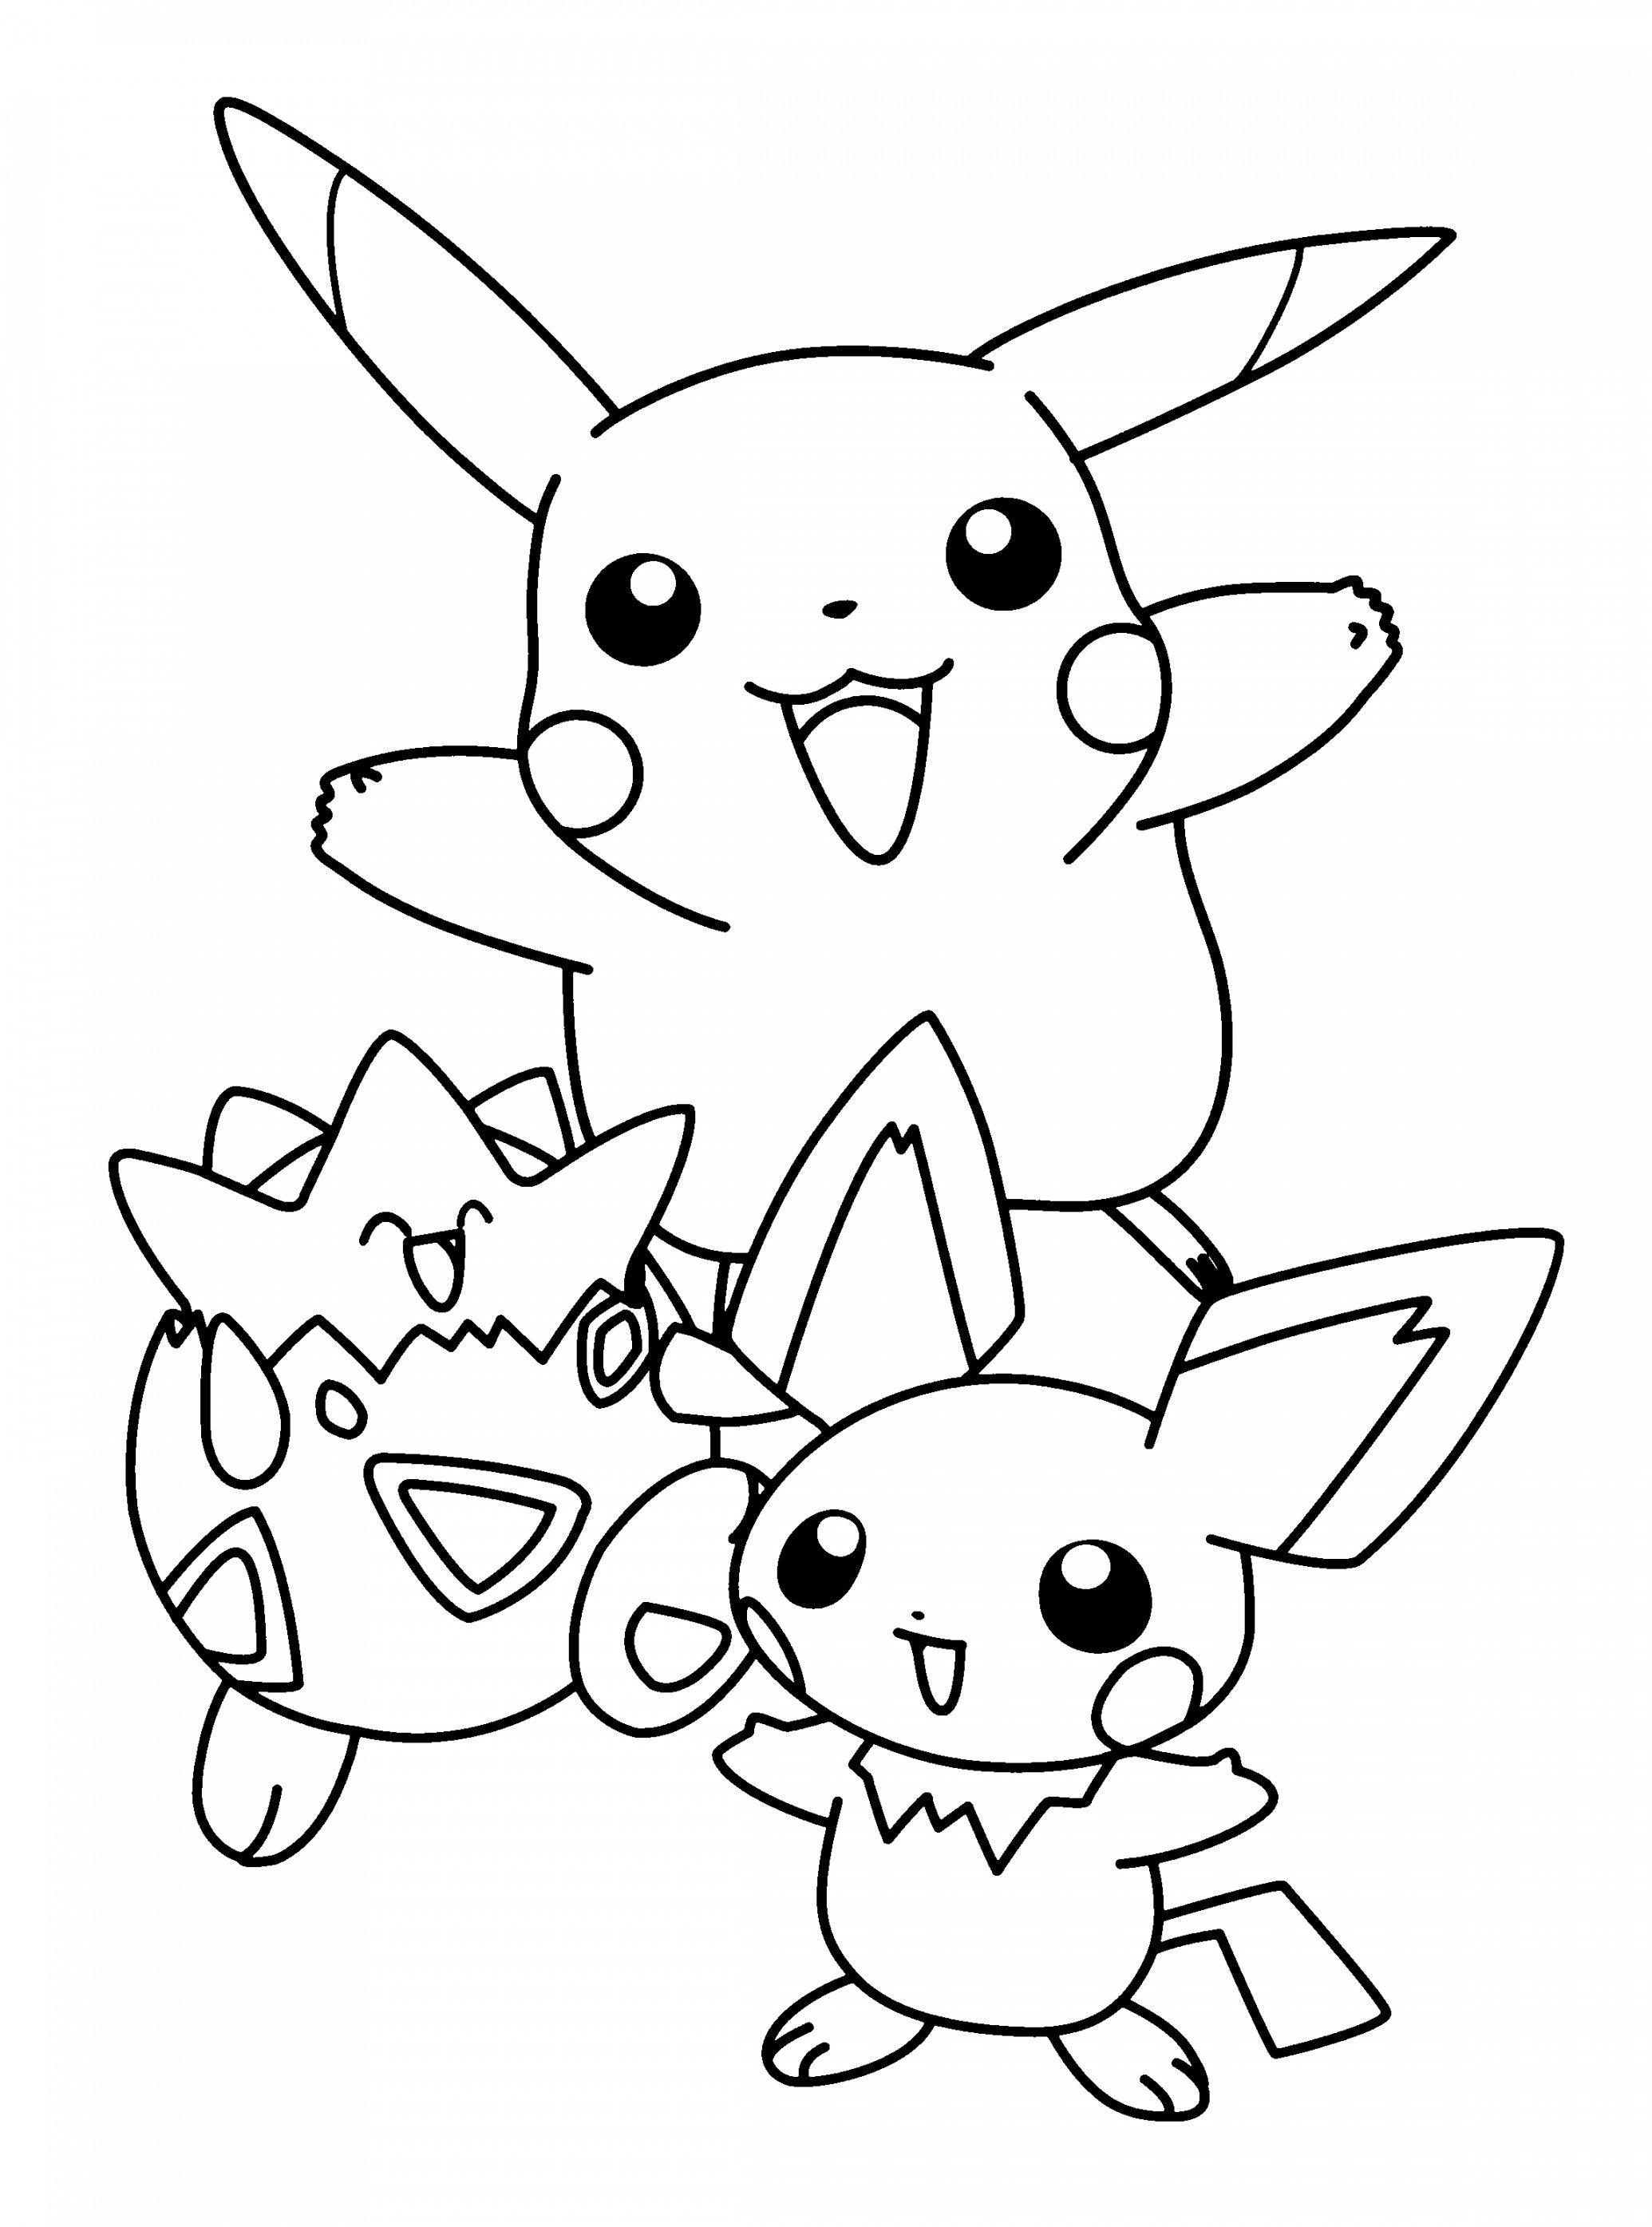 27+ Inspiration Image of Free Printable Pokemon Coloring ...